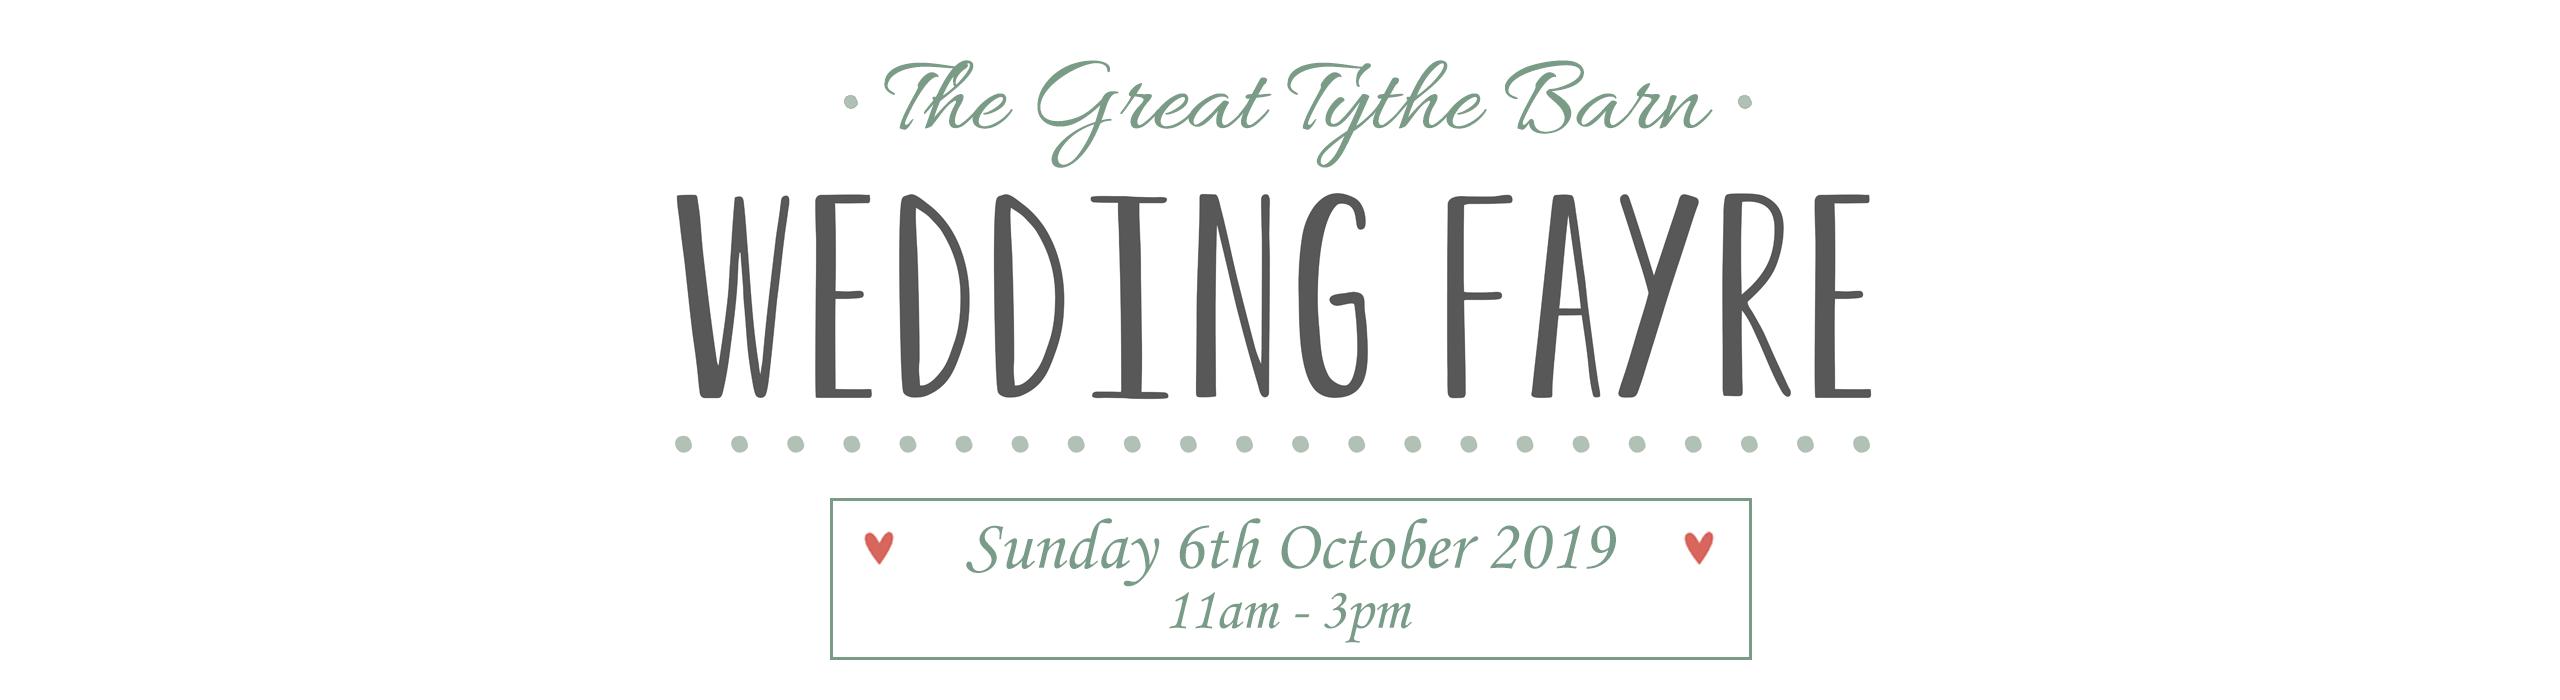 GTB Wedding Fayre October 2019